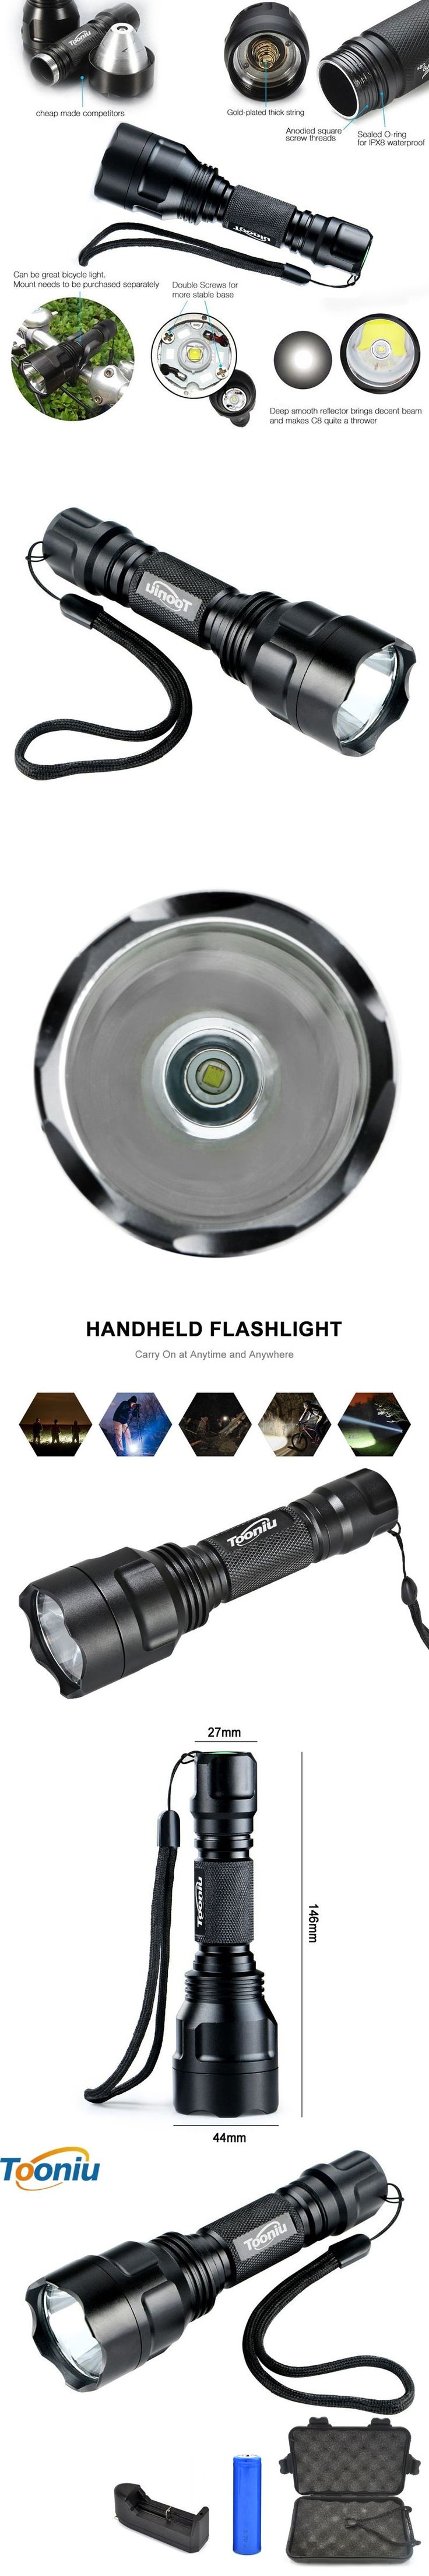 LED Flashlight XML-L2 8000LM C8 Tactical  LED Flashlight Aluminum Hunting Flashlight Torch Lamp +18650+Charger